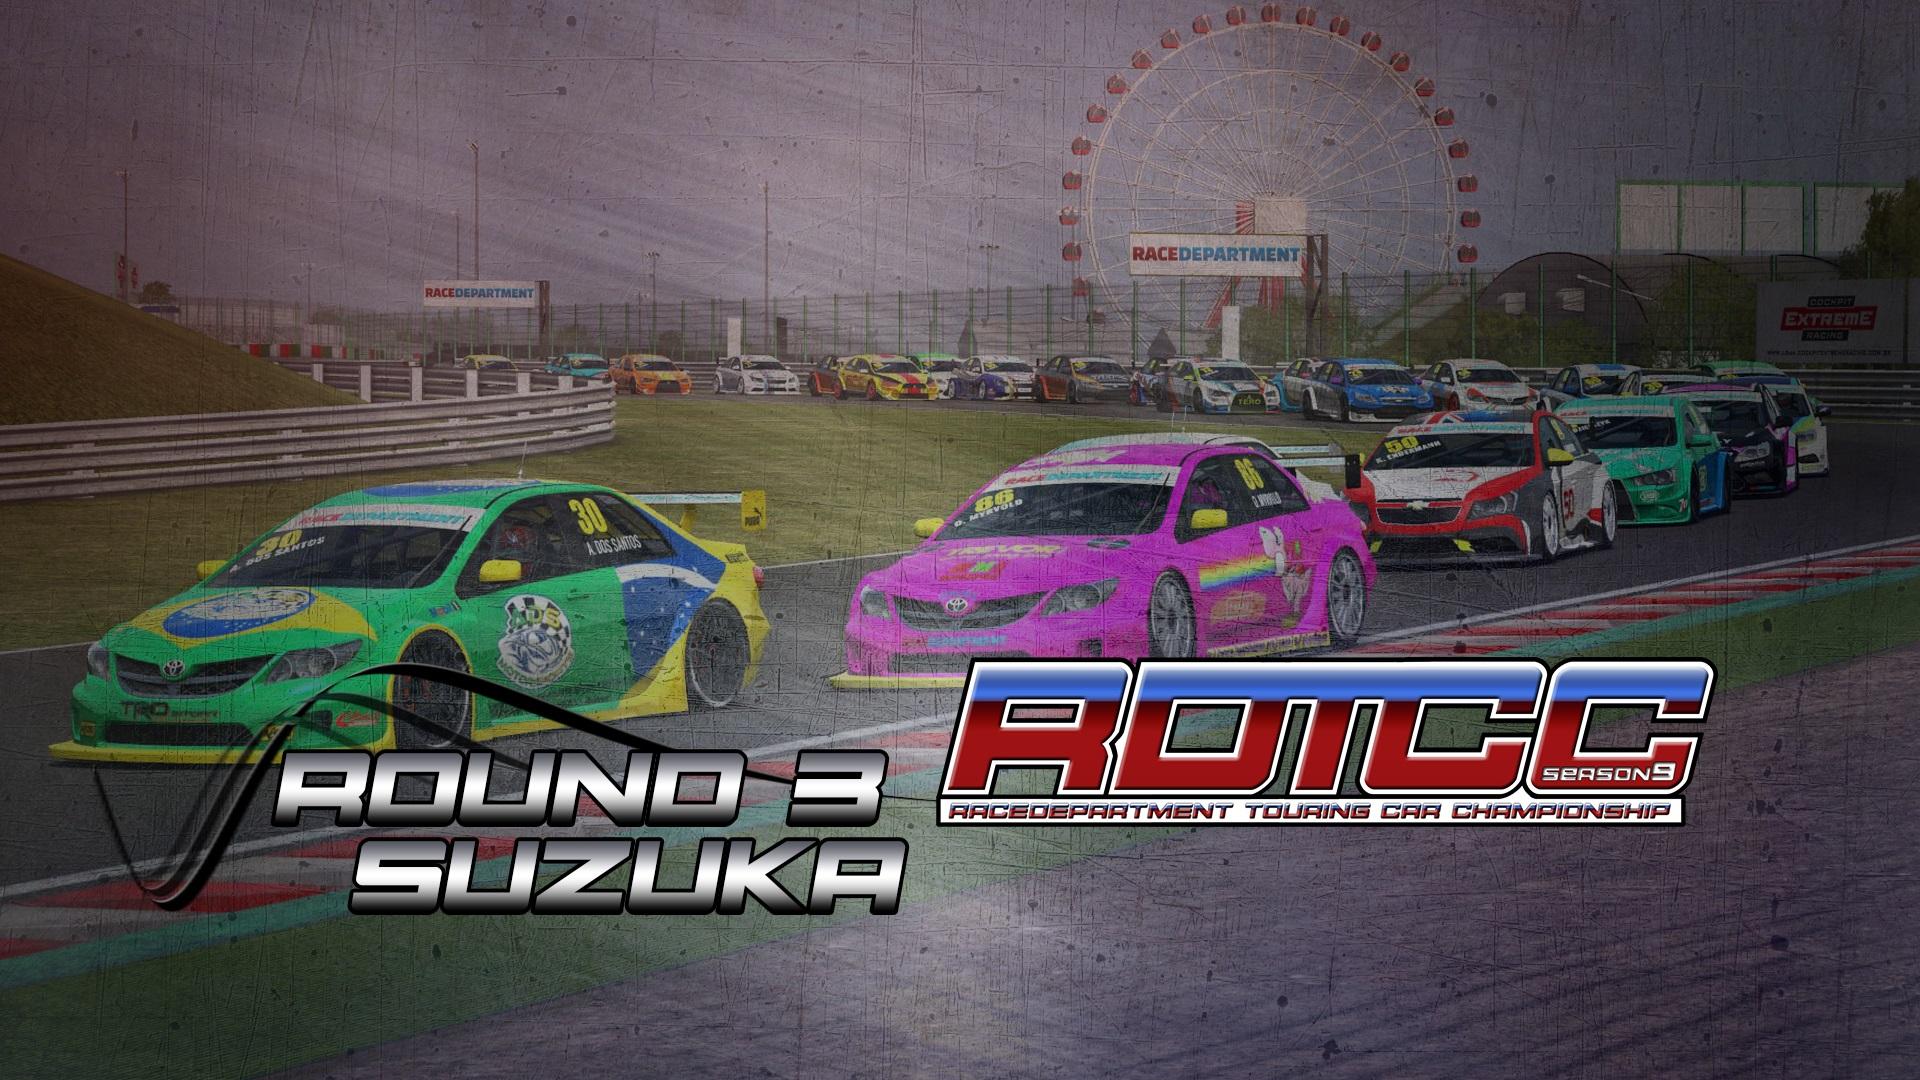 RDTCC Suzuka.jpg